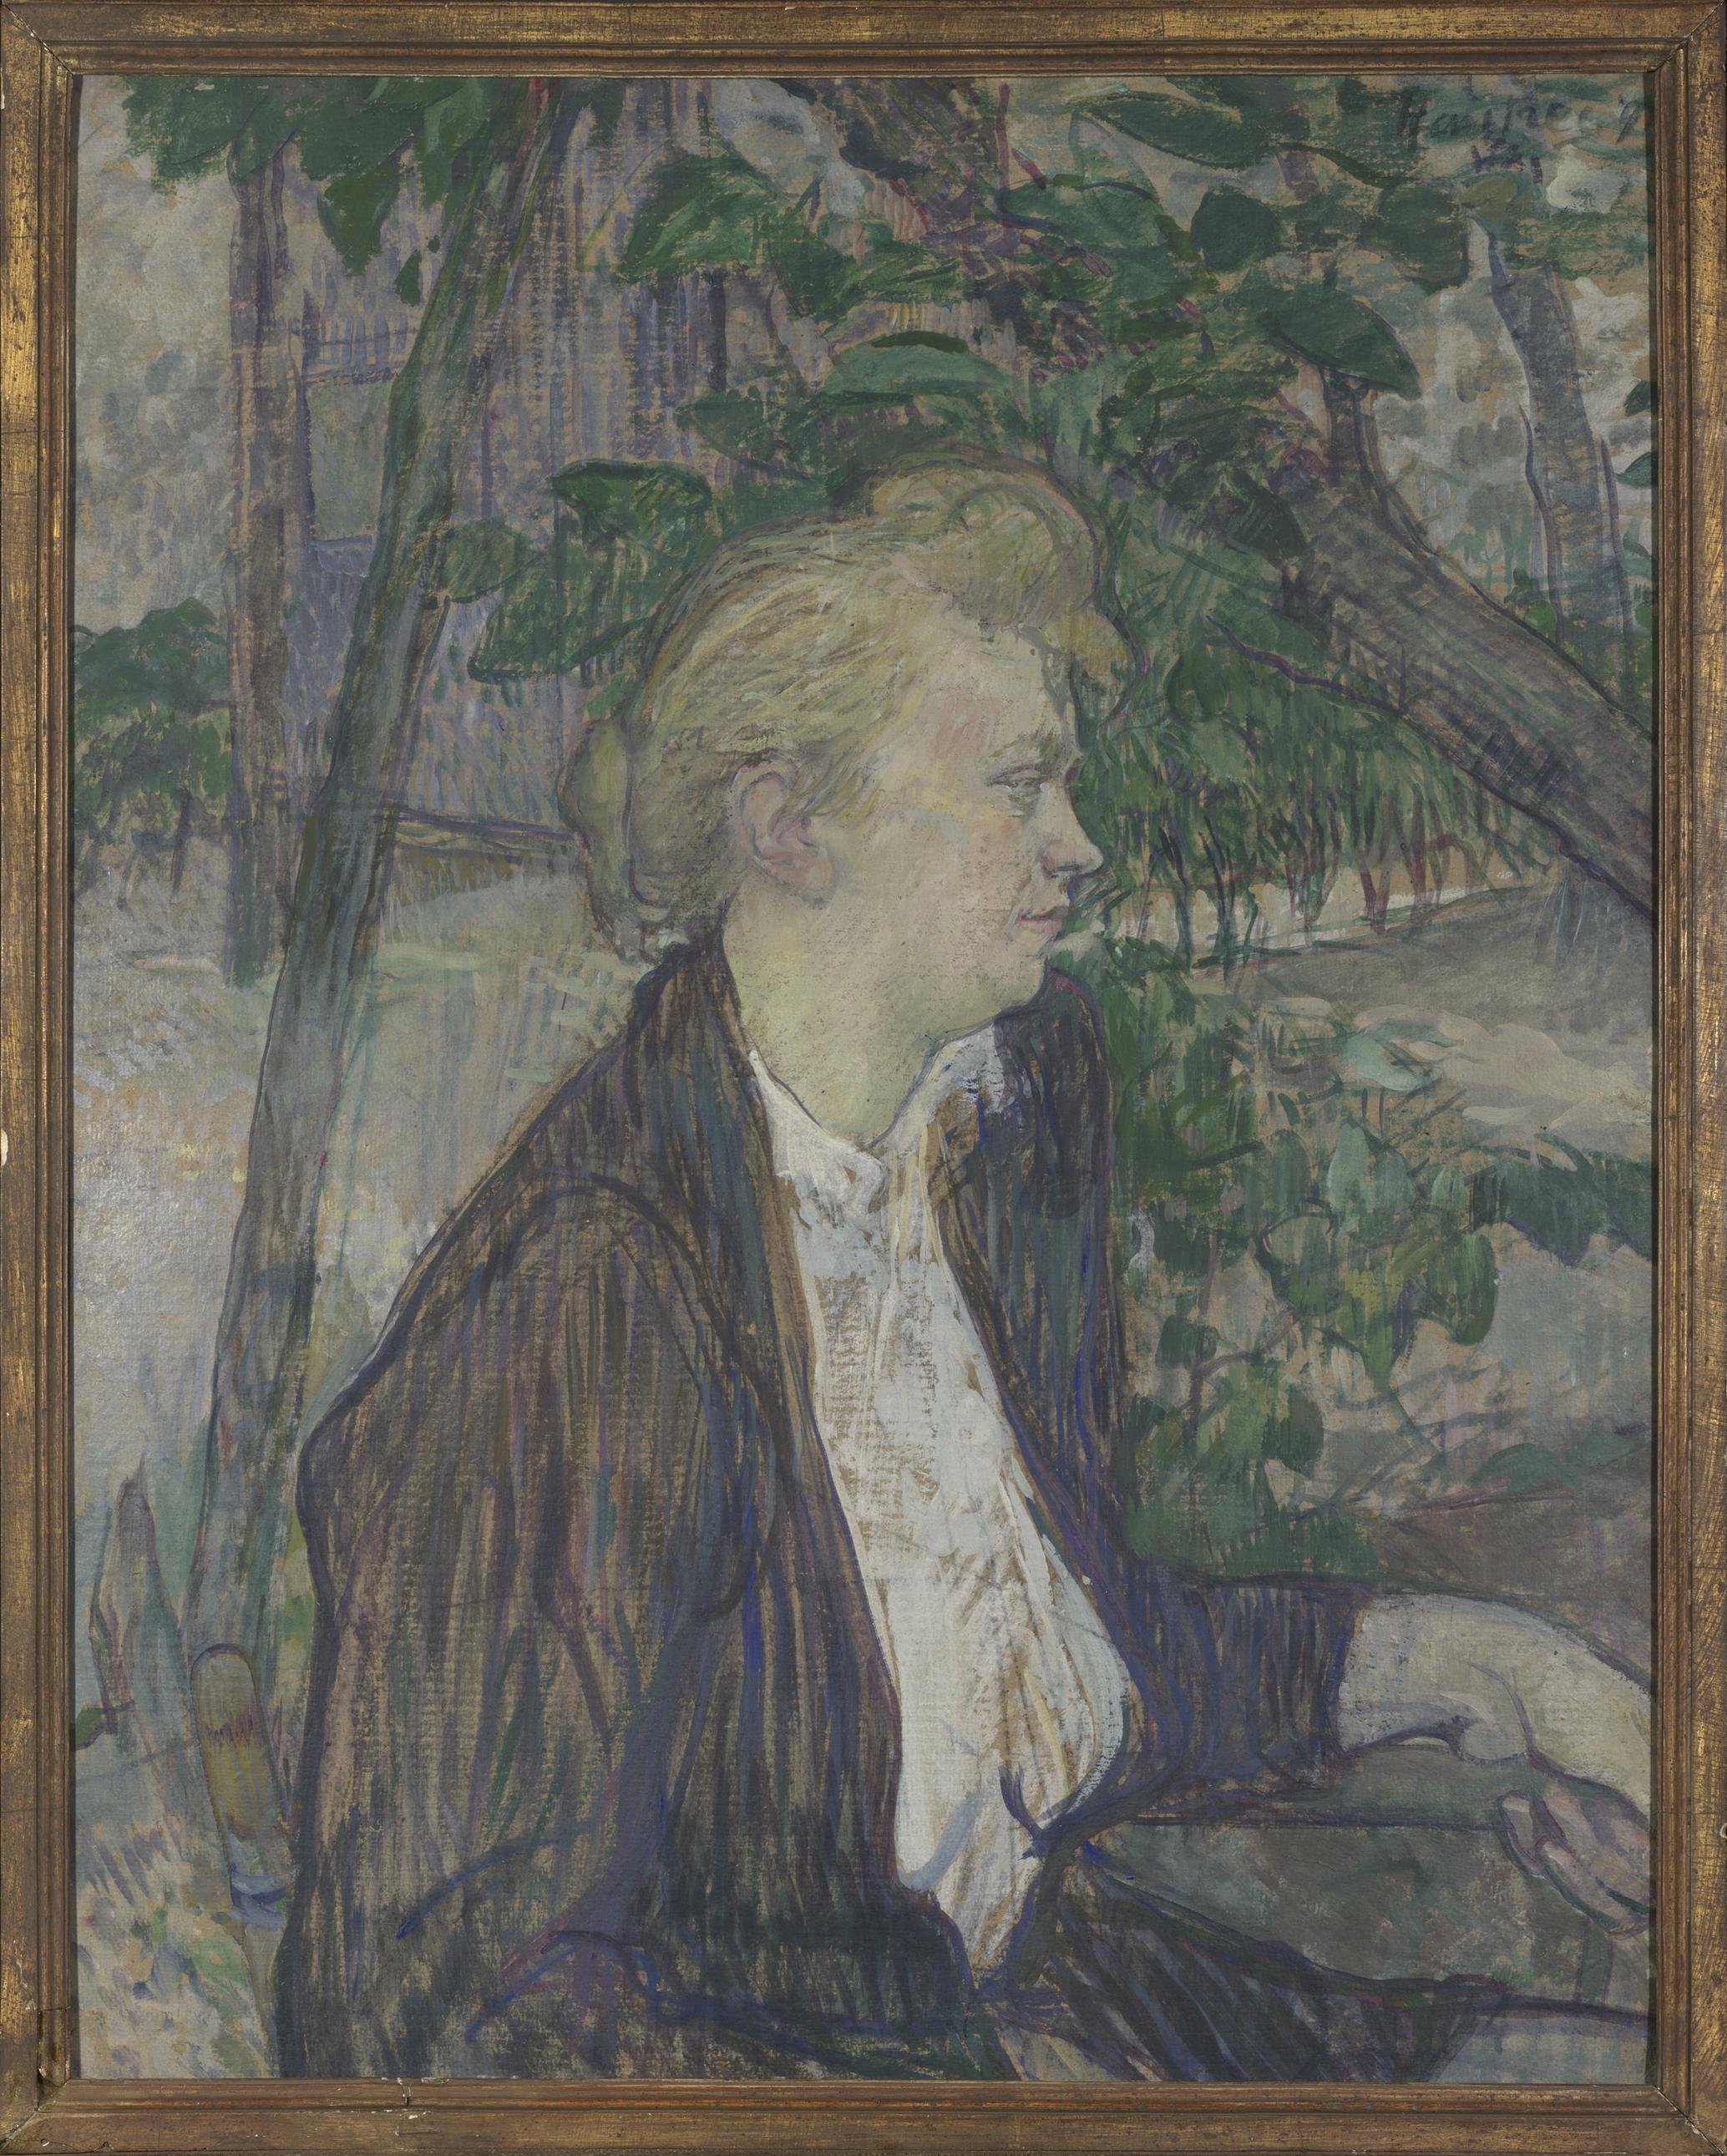 Woman seated in a Garden - Henri de Toulouse-Lautrec, 1891